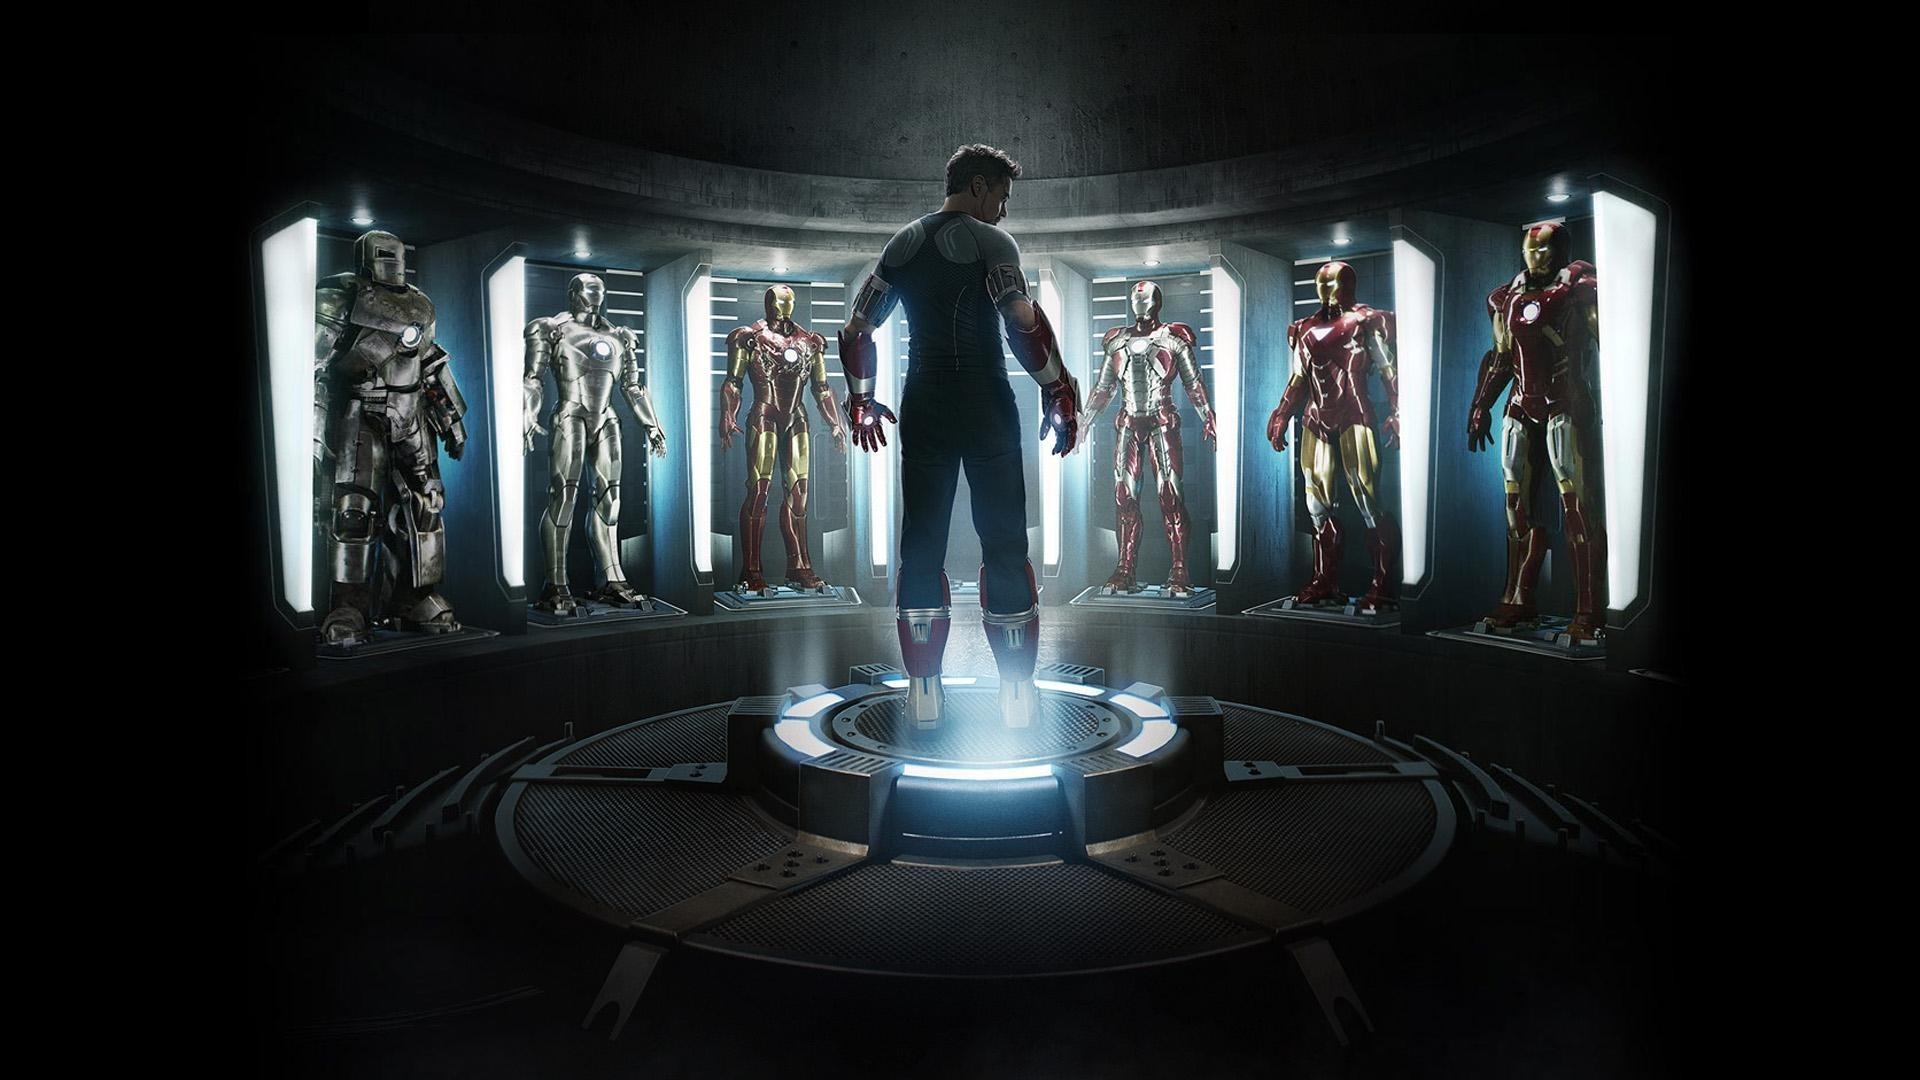 Wallpaper 1920x1080 Px Iron Man Iron Man 3 Robert Downey Jr